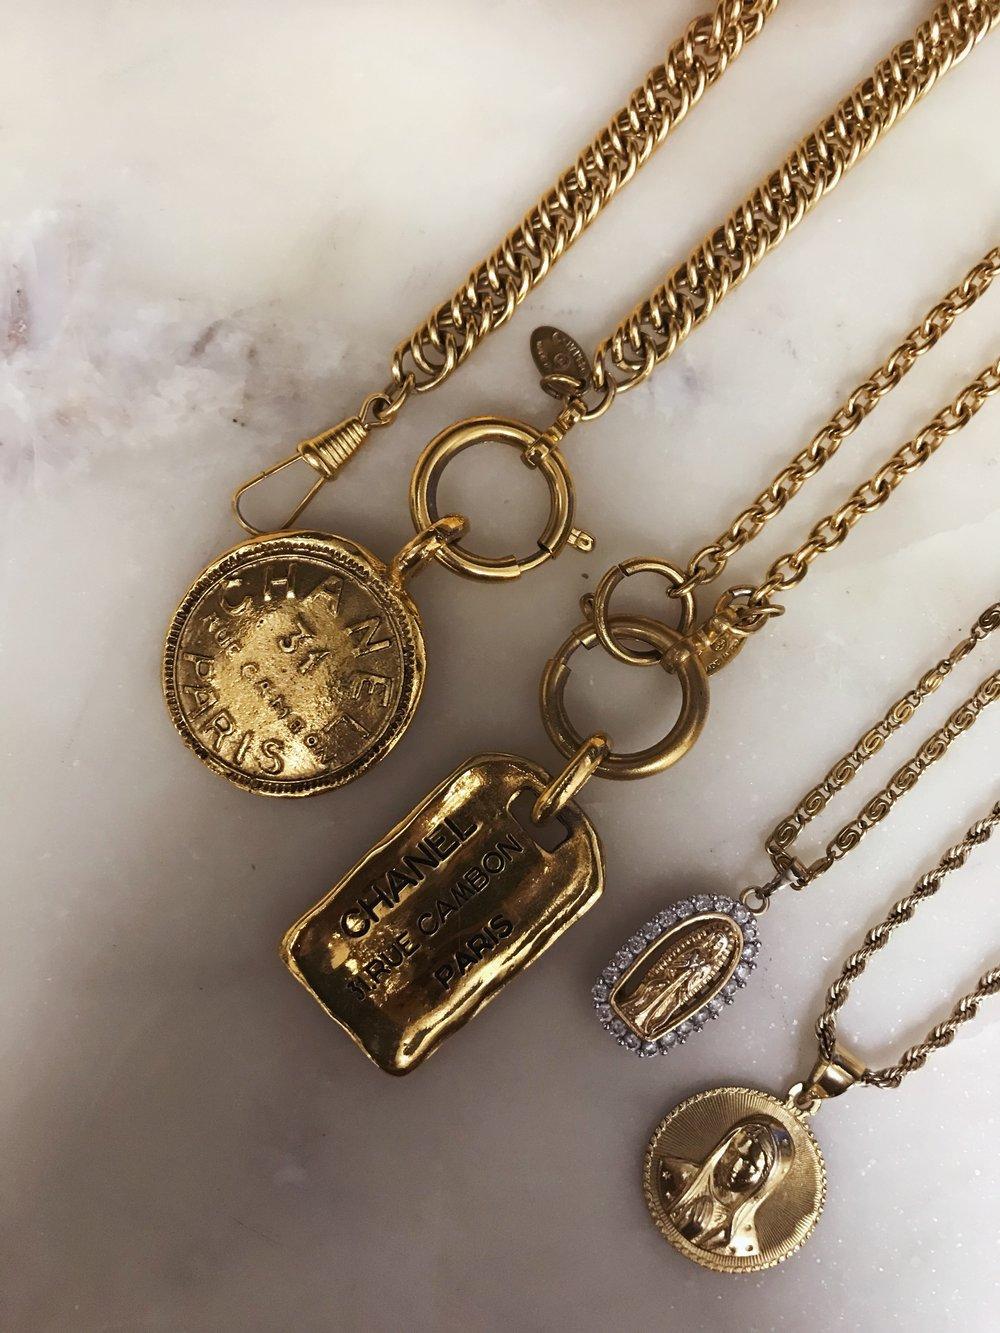 Dennaya-Famous-Gold-Necklaces-2.jpeg